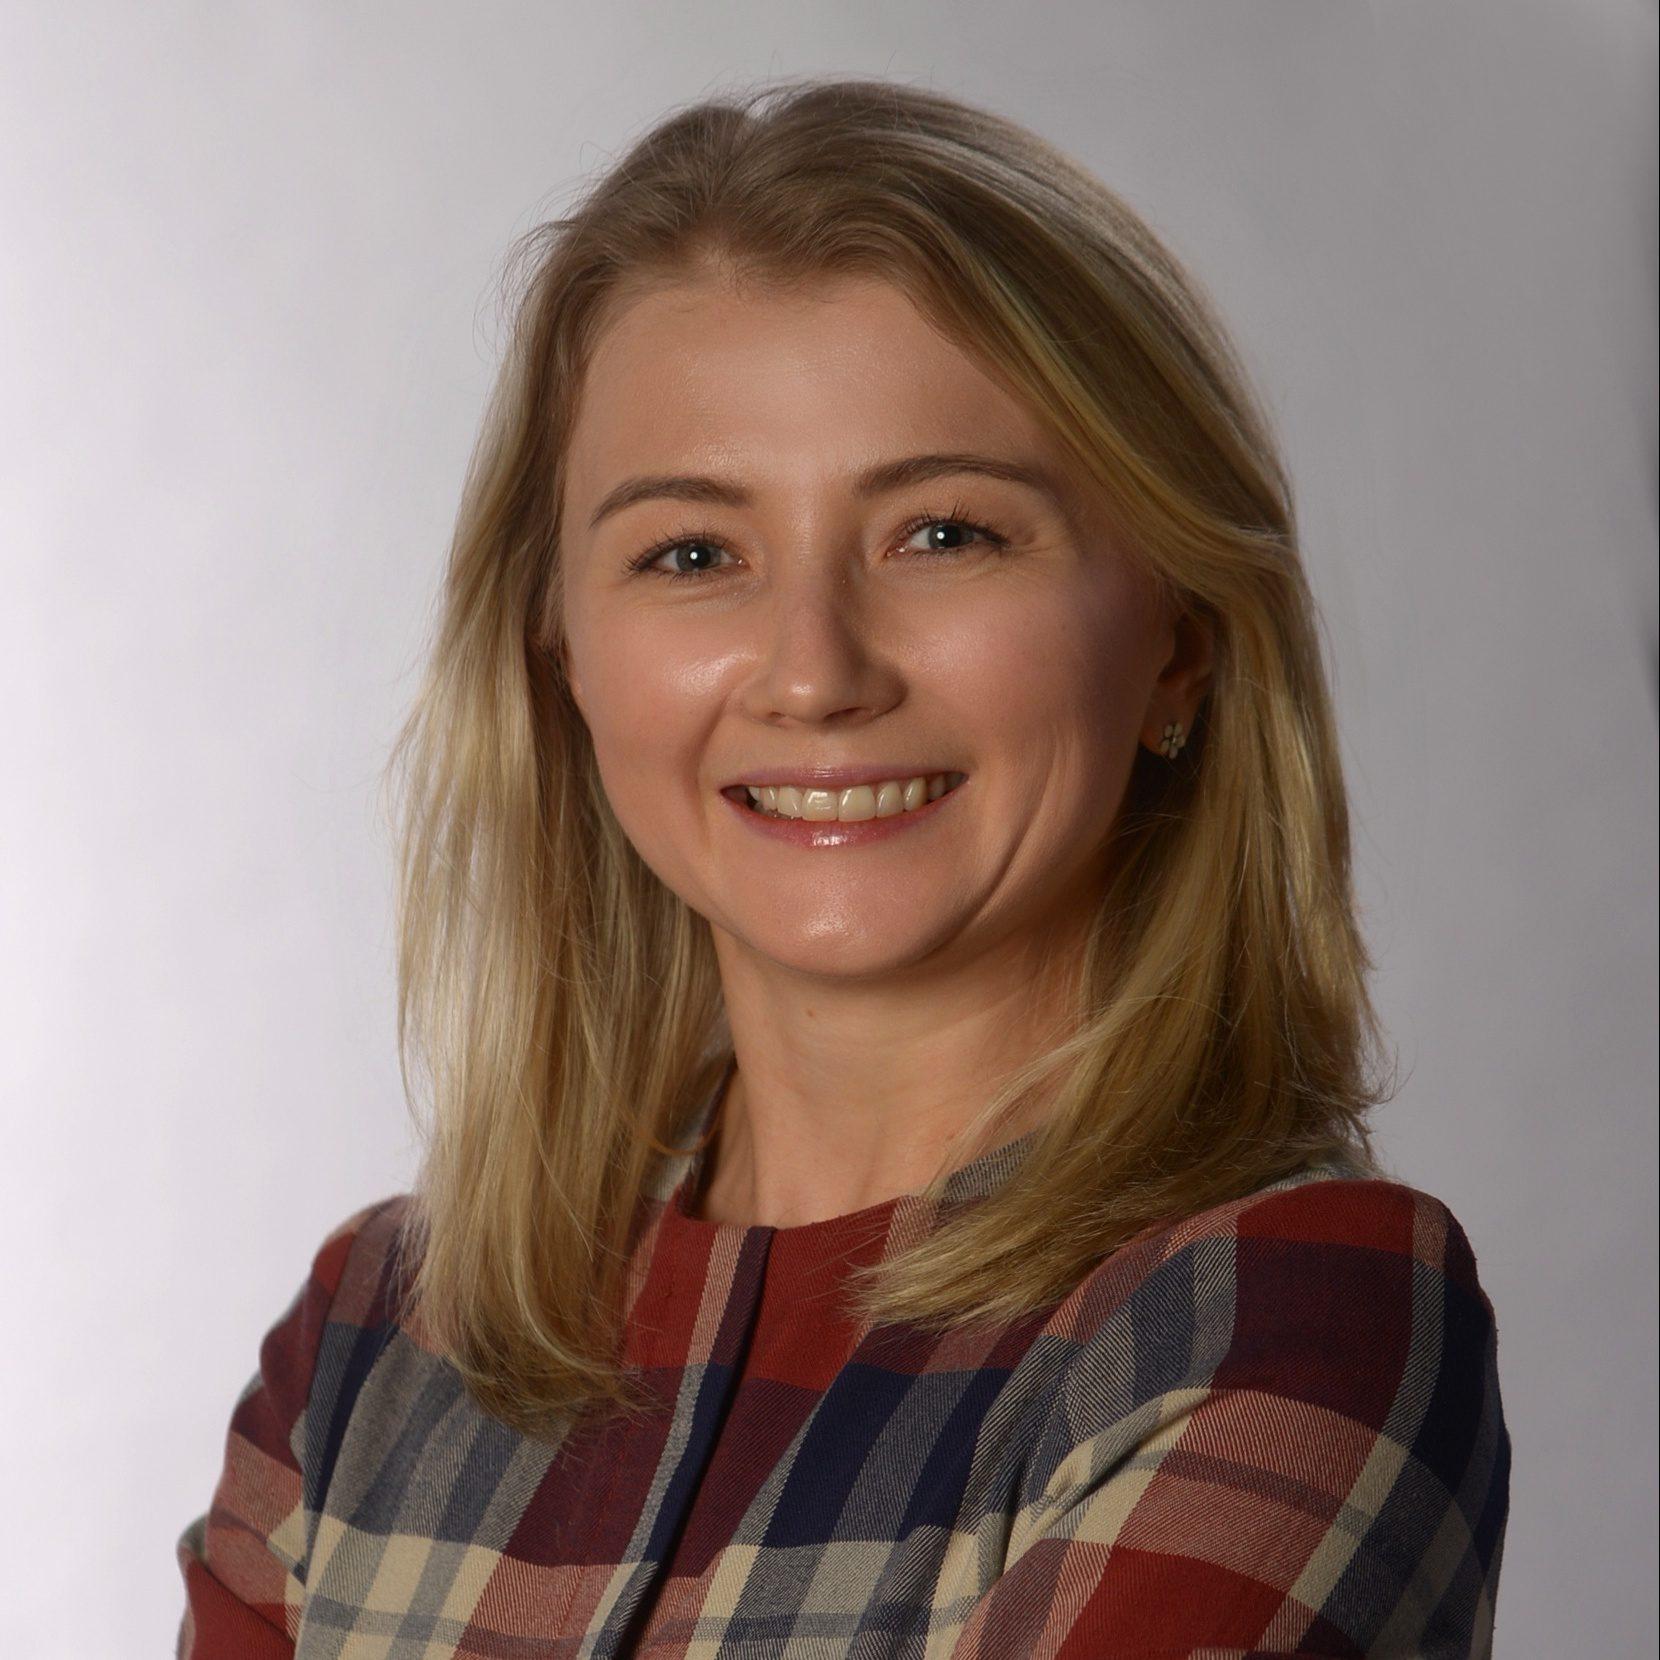 Kateryna Oliferchuk